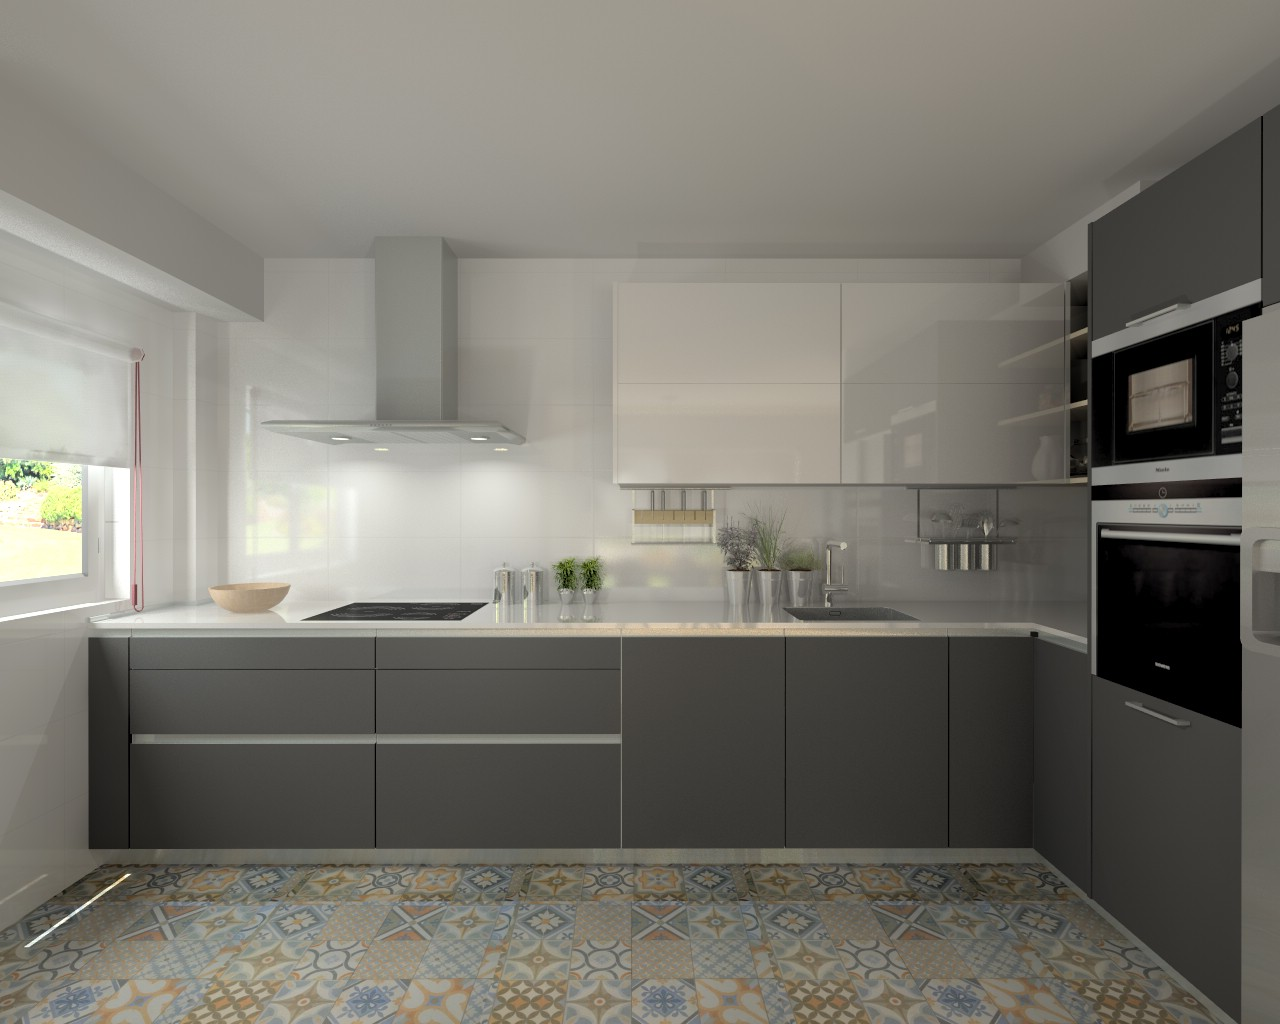 Madrid cocina santos modelo line e gris y line l for Muebles de cocina gris